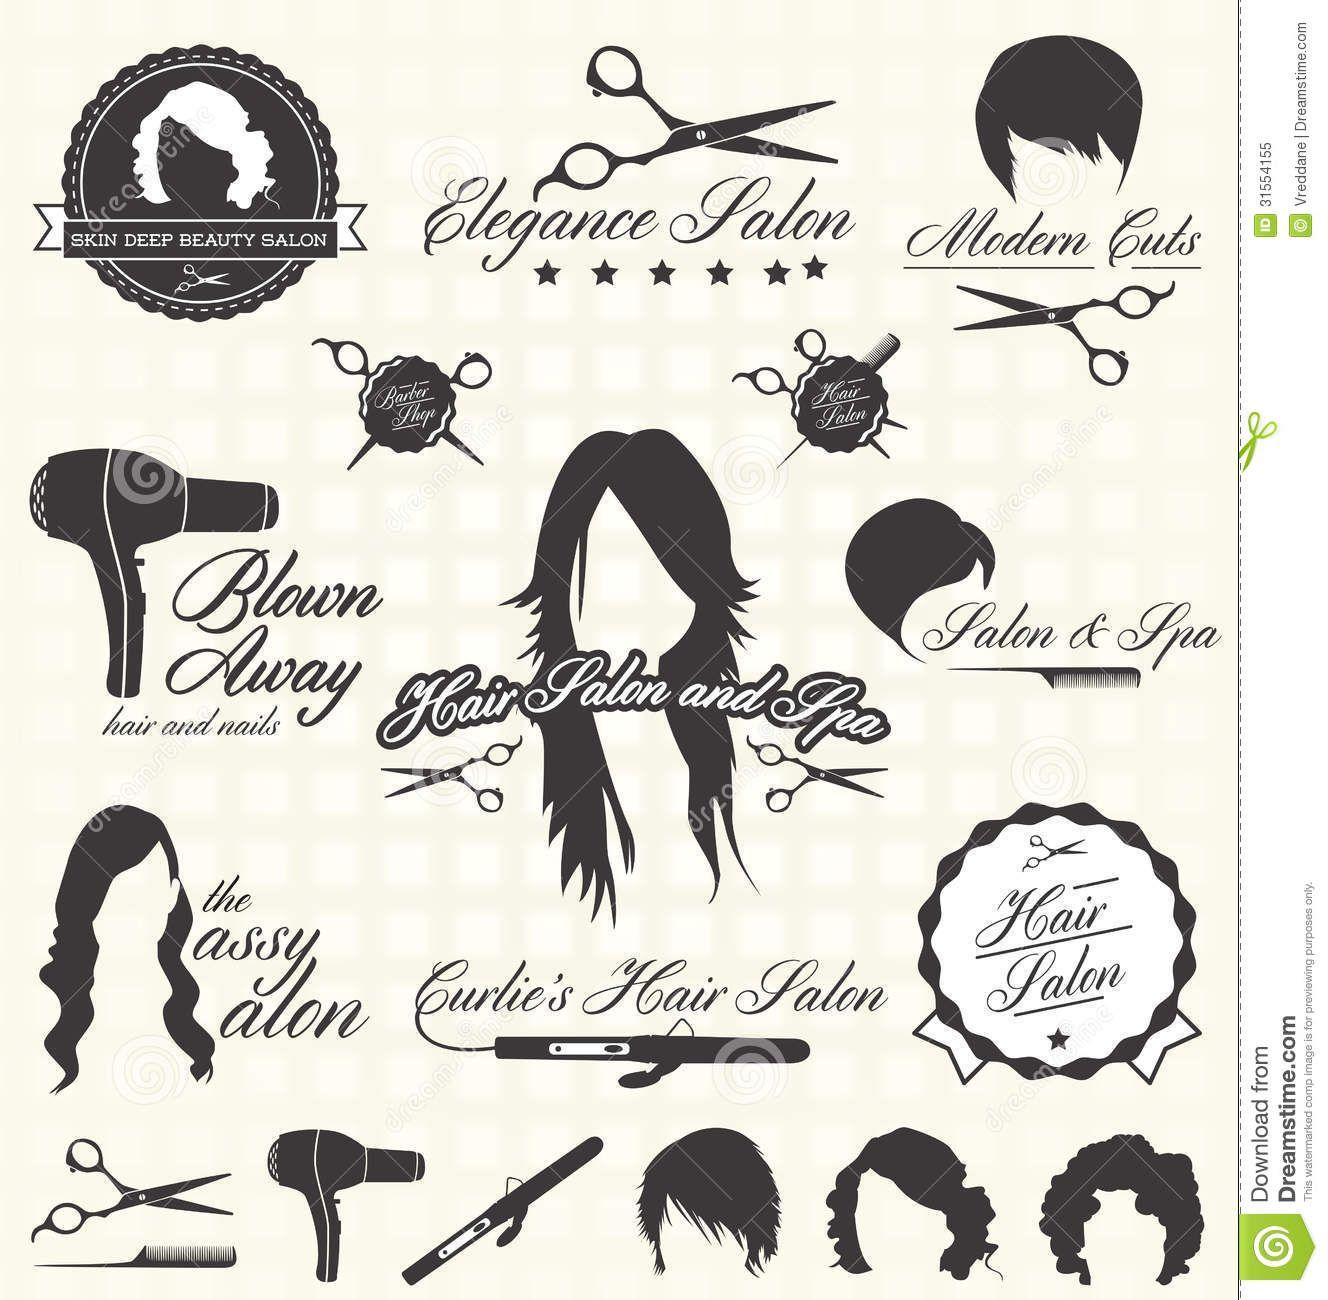 Transparent Hair Stylist Tools Clipart - Pink Hair Scissors Clipart, HD Png  Download , Transparent Png Image - PNGitem